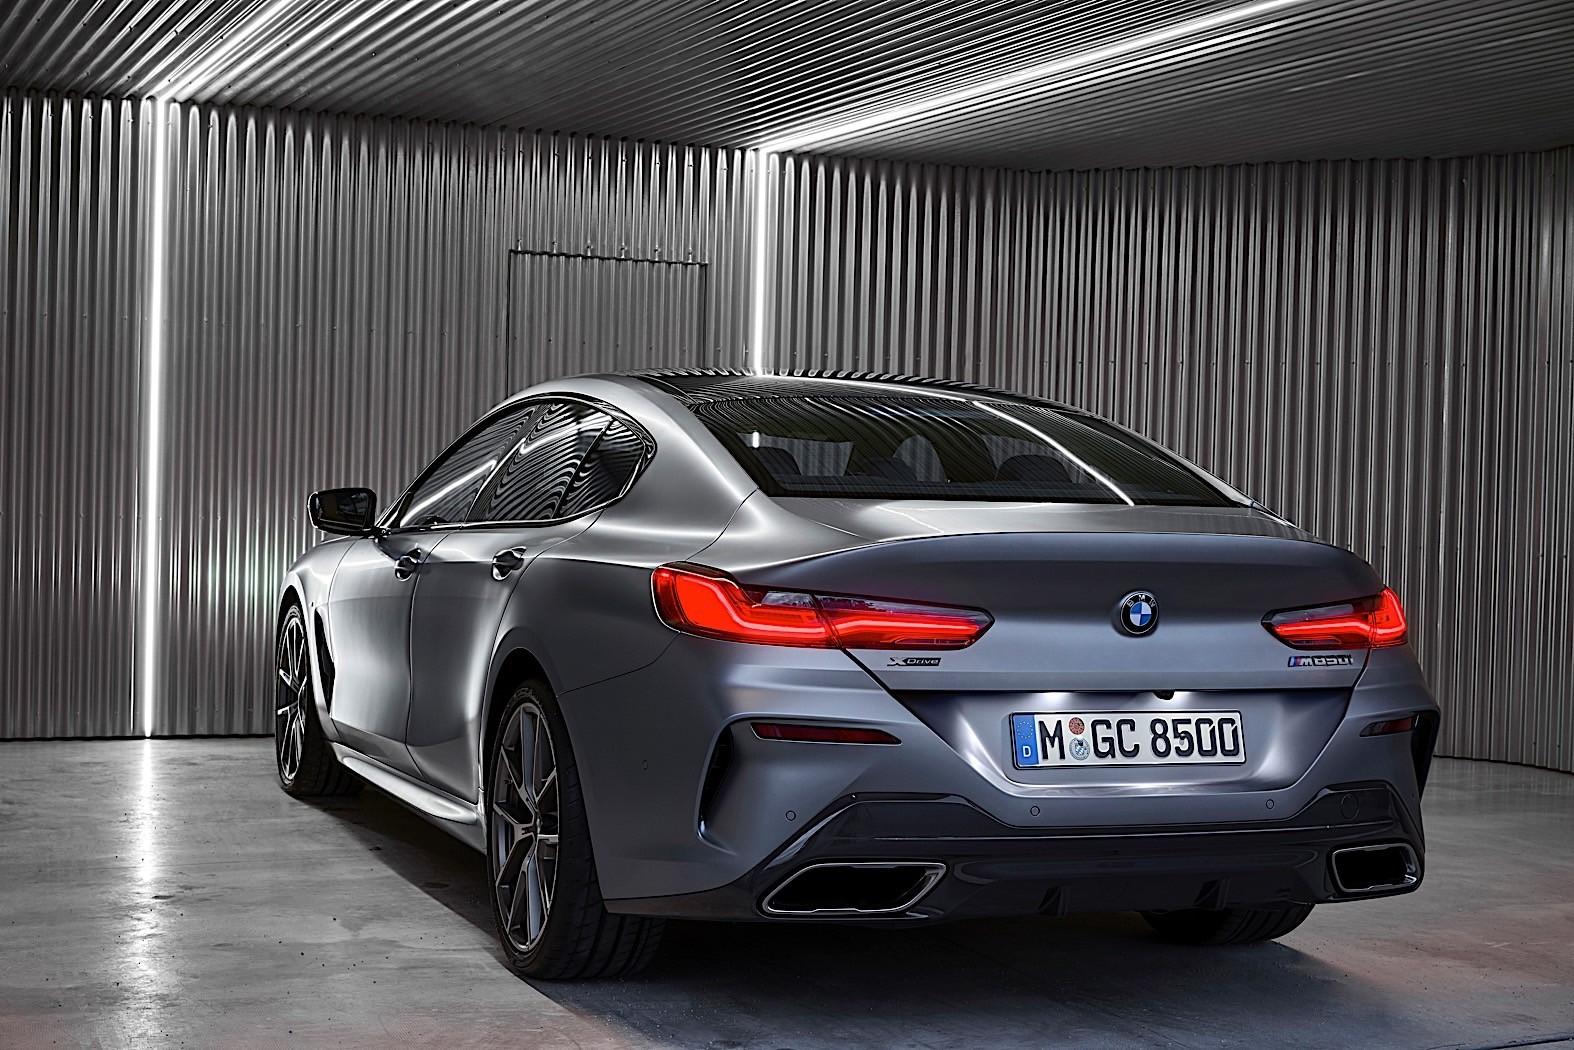 2020 bmw 8 series gran coupe breaks cover as four-door premium sports car